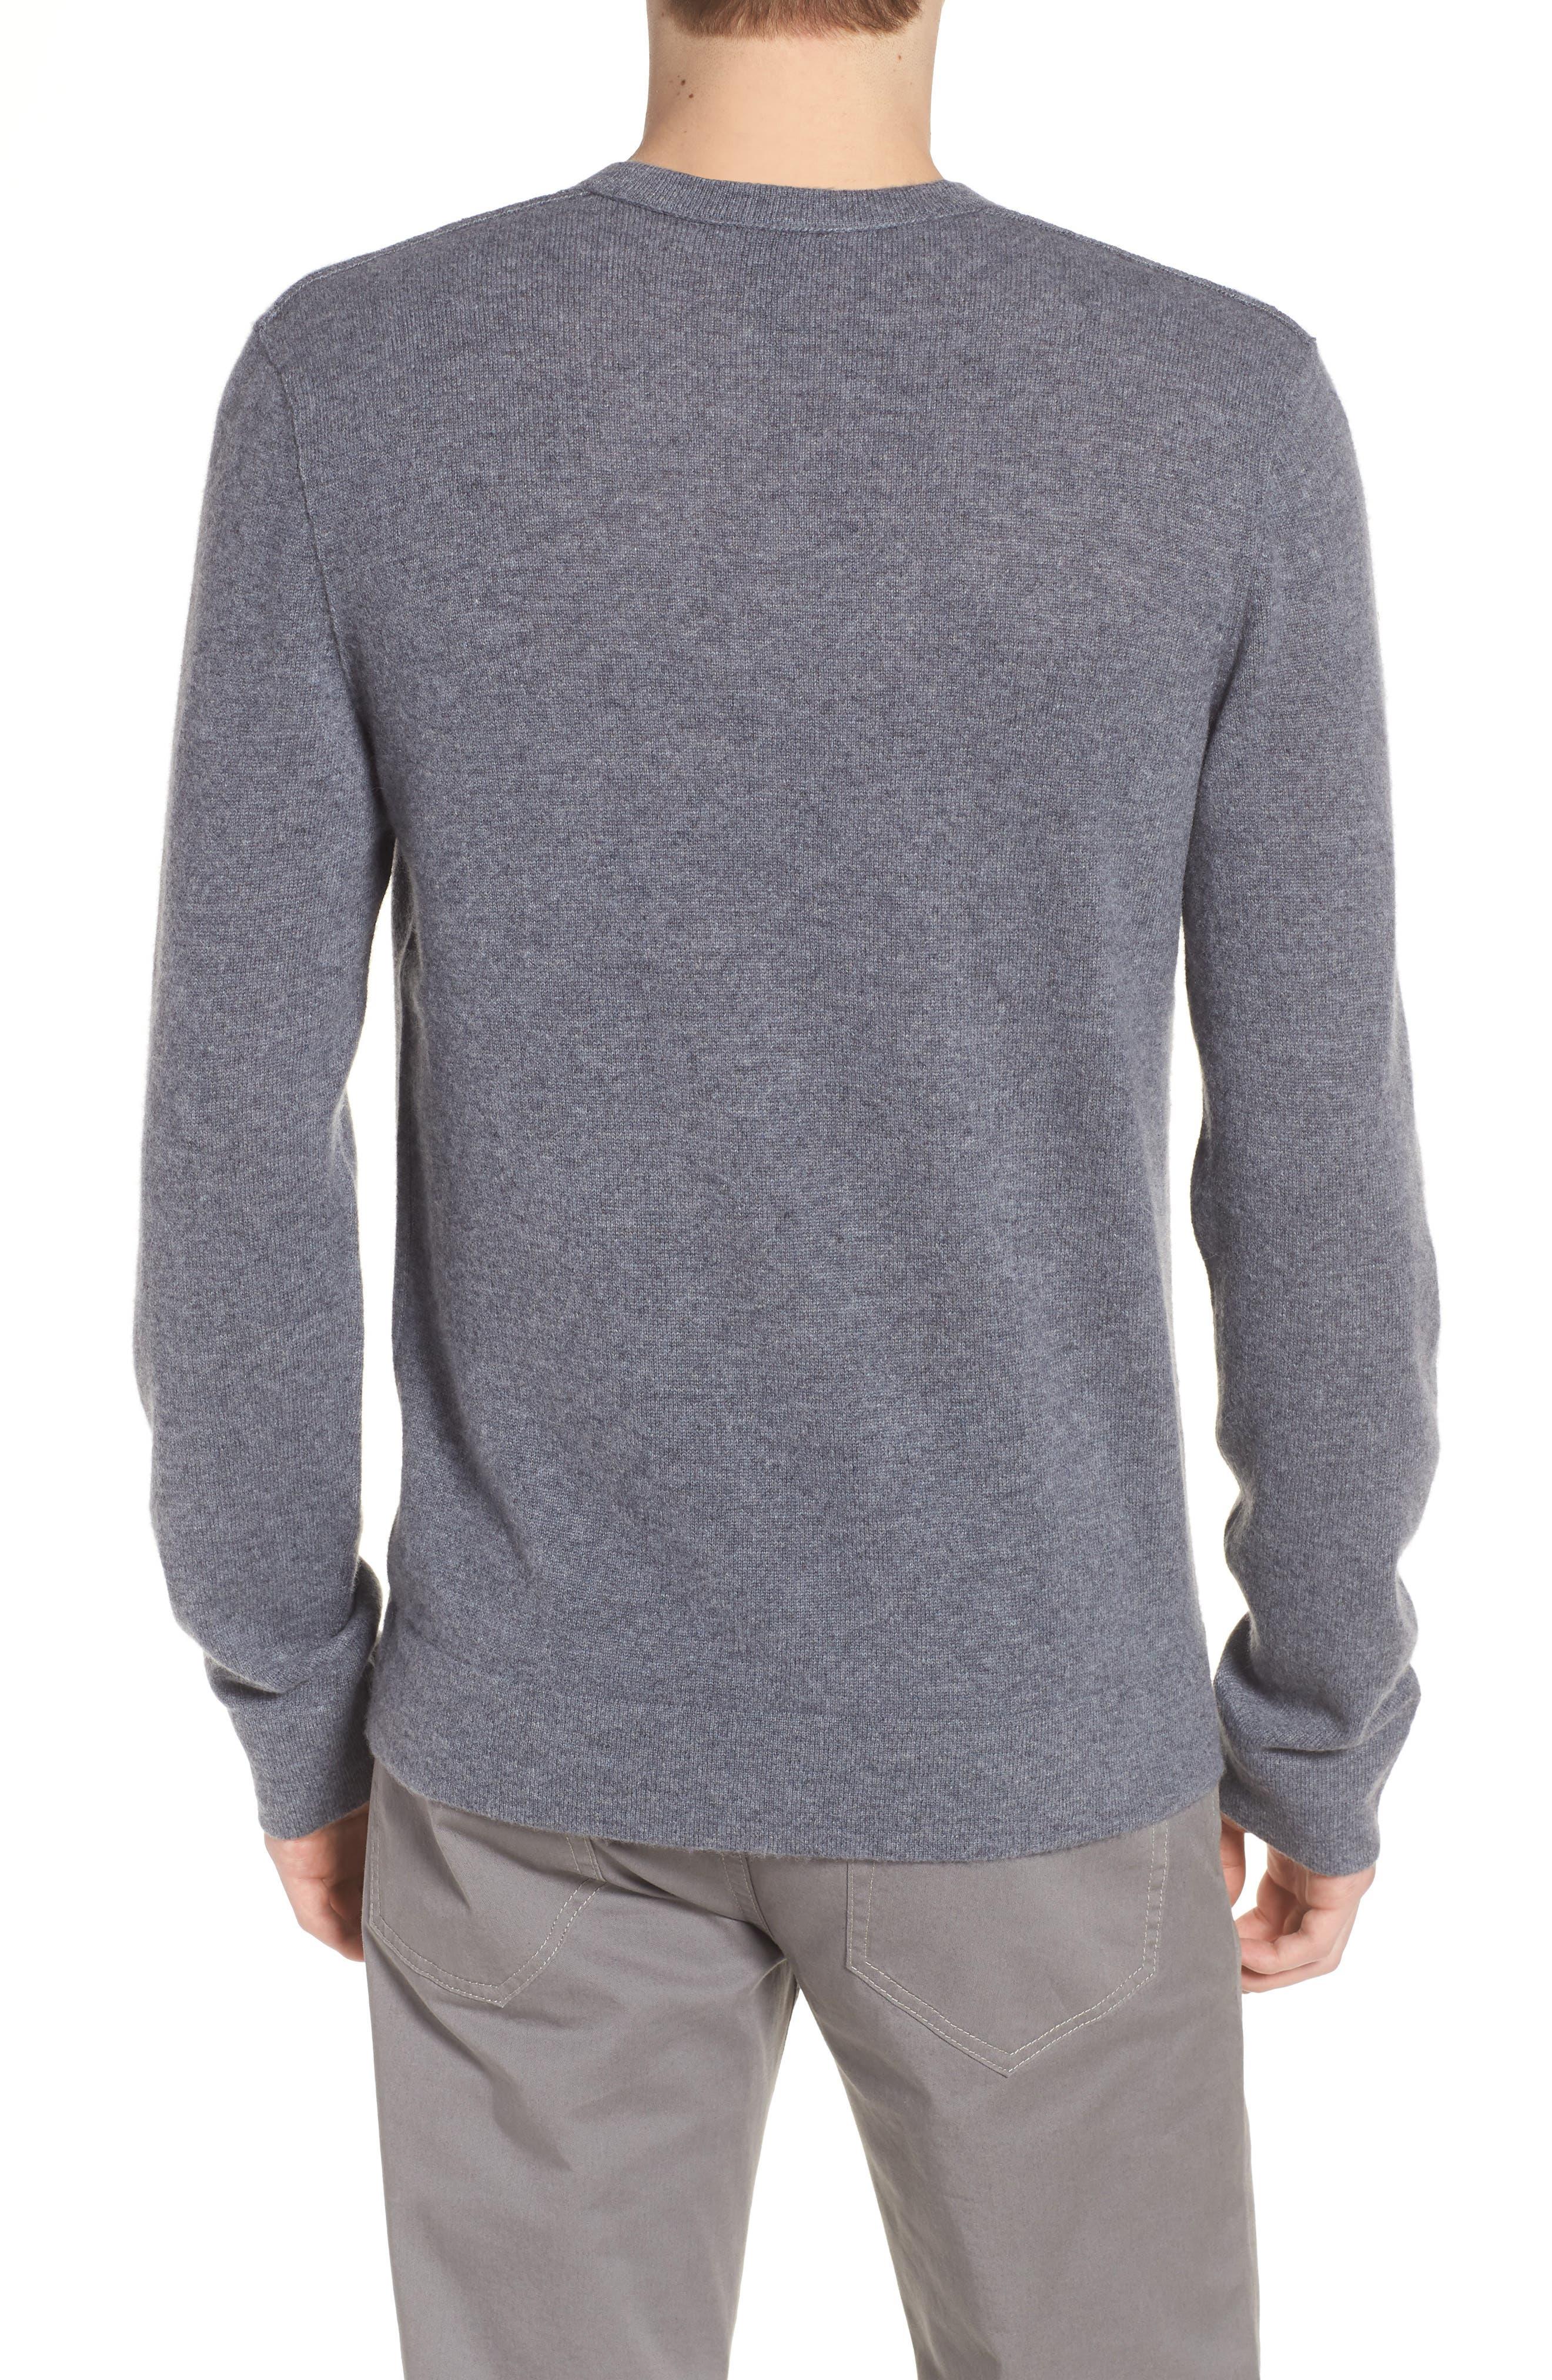 Alternate Image 2  - James Perse Cashmere V-Neck Sweater